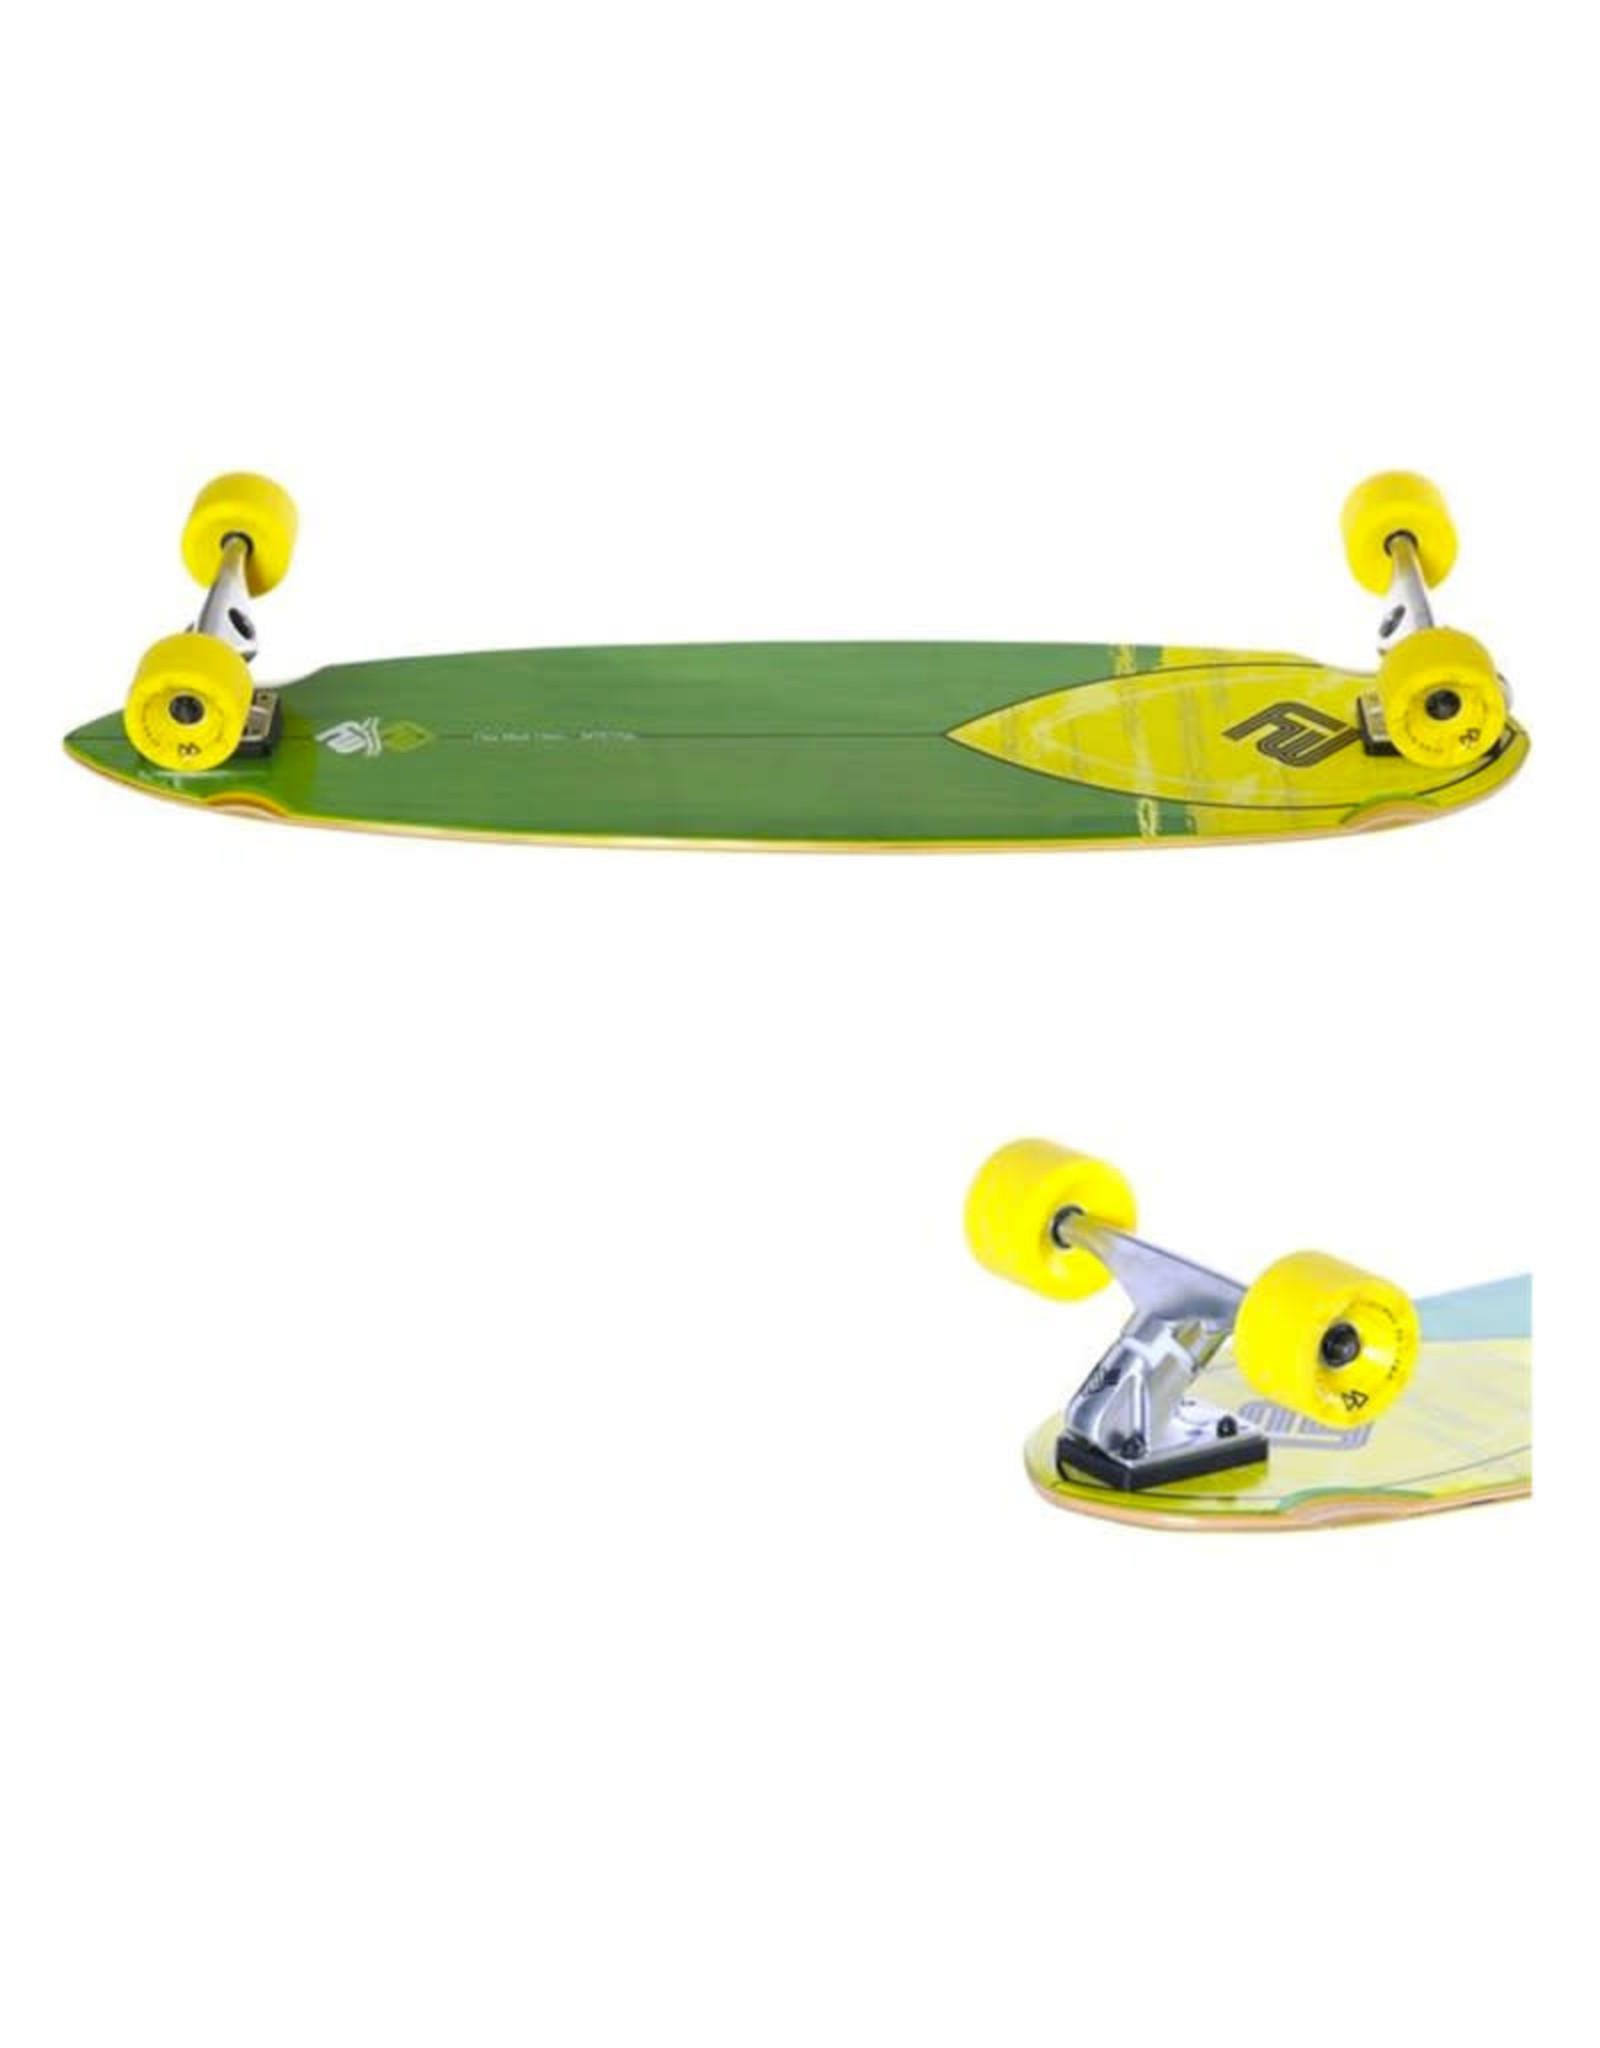 Flying Wheels Flying Wheels Surf Skateboard 36 Pupukea Capitol Surf Truck